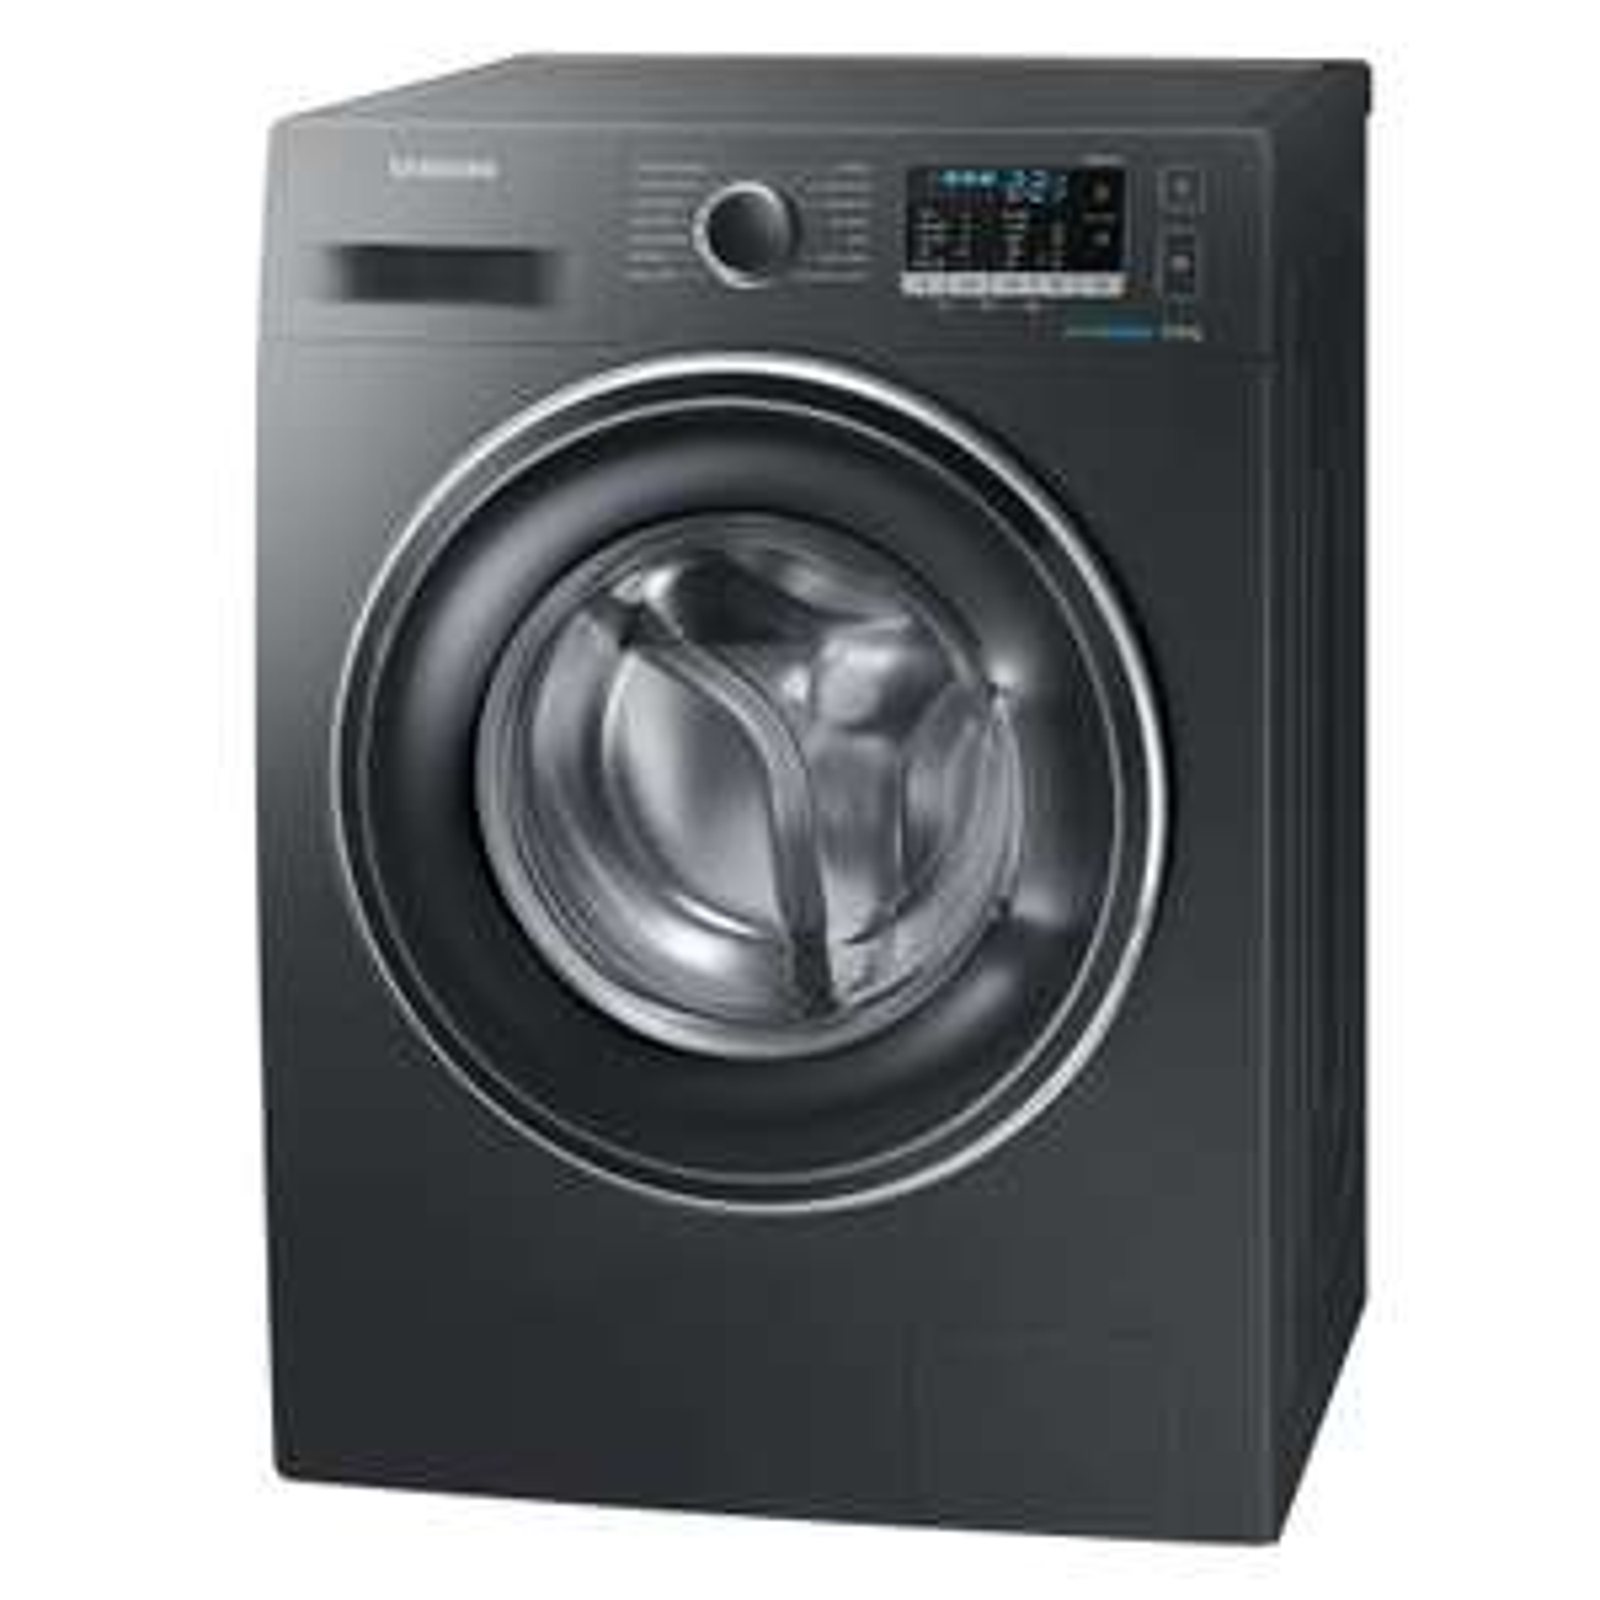 Samsung WW80J5555EX 8KG 1400RPM Graphite Ecobubble Washing Machine £322.15 with code @ Crampton&Moore ebay